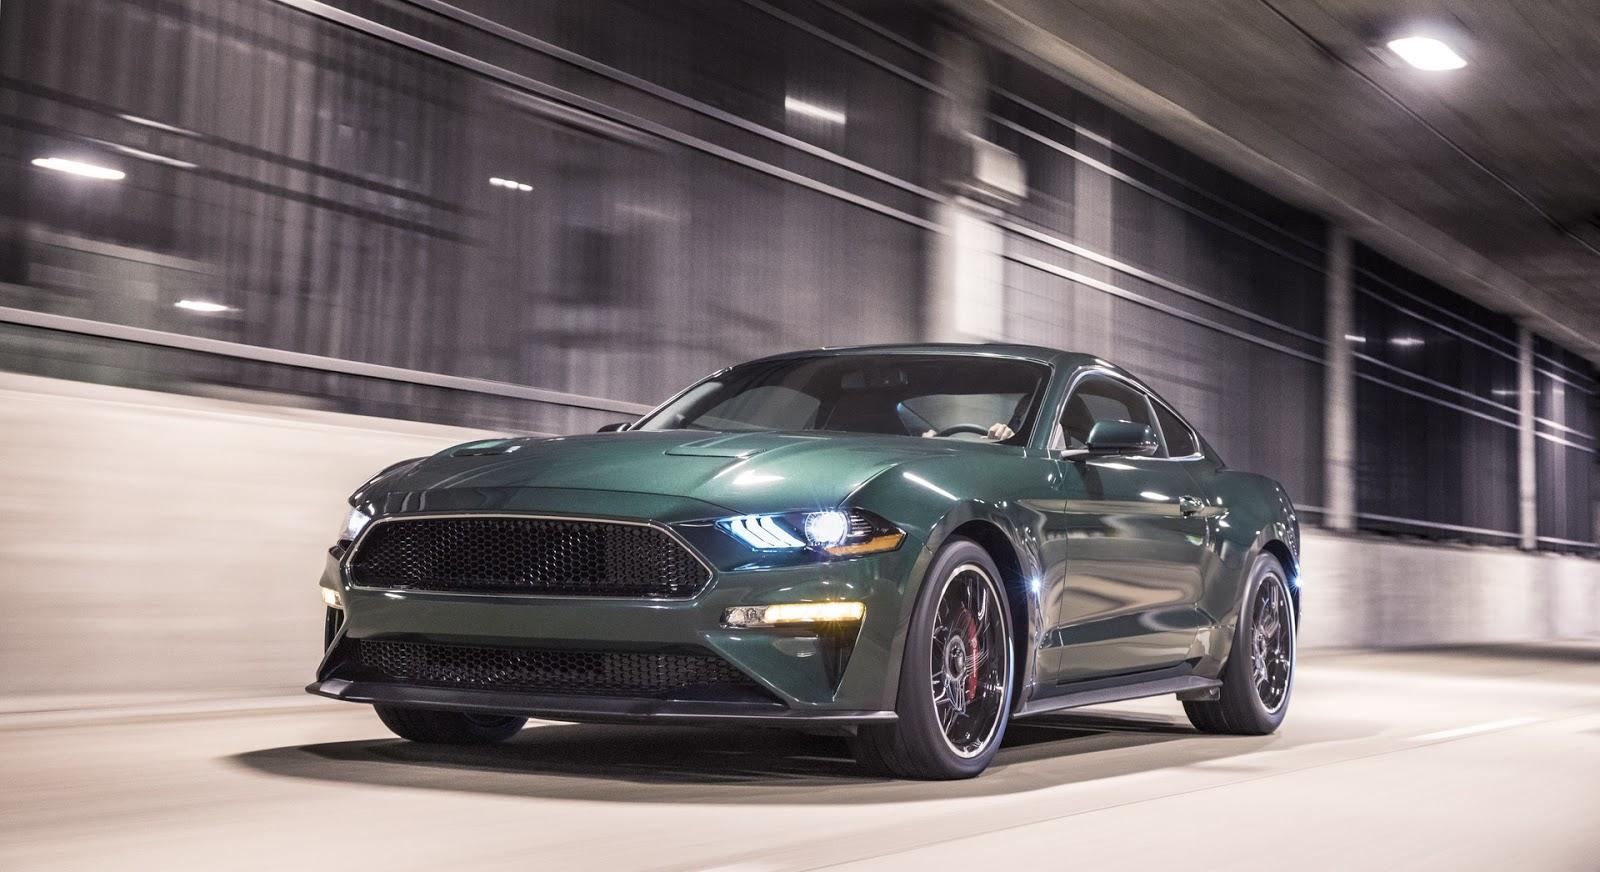 2019-Mustang-Bullitt-3-1